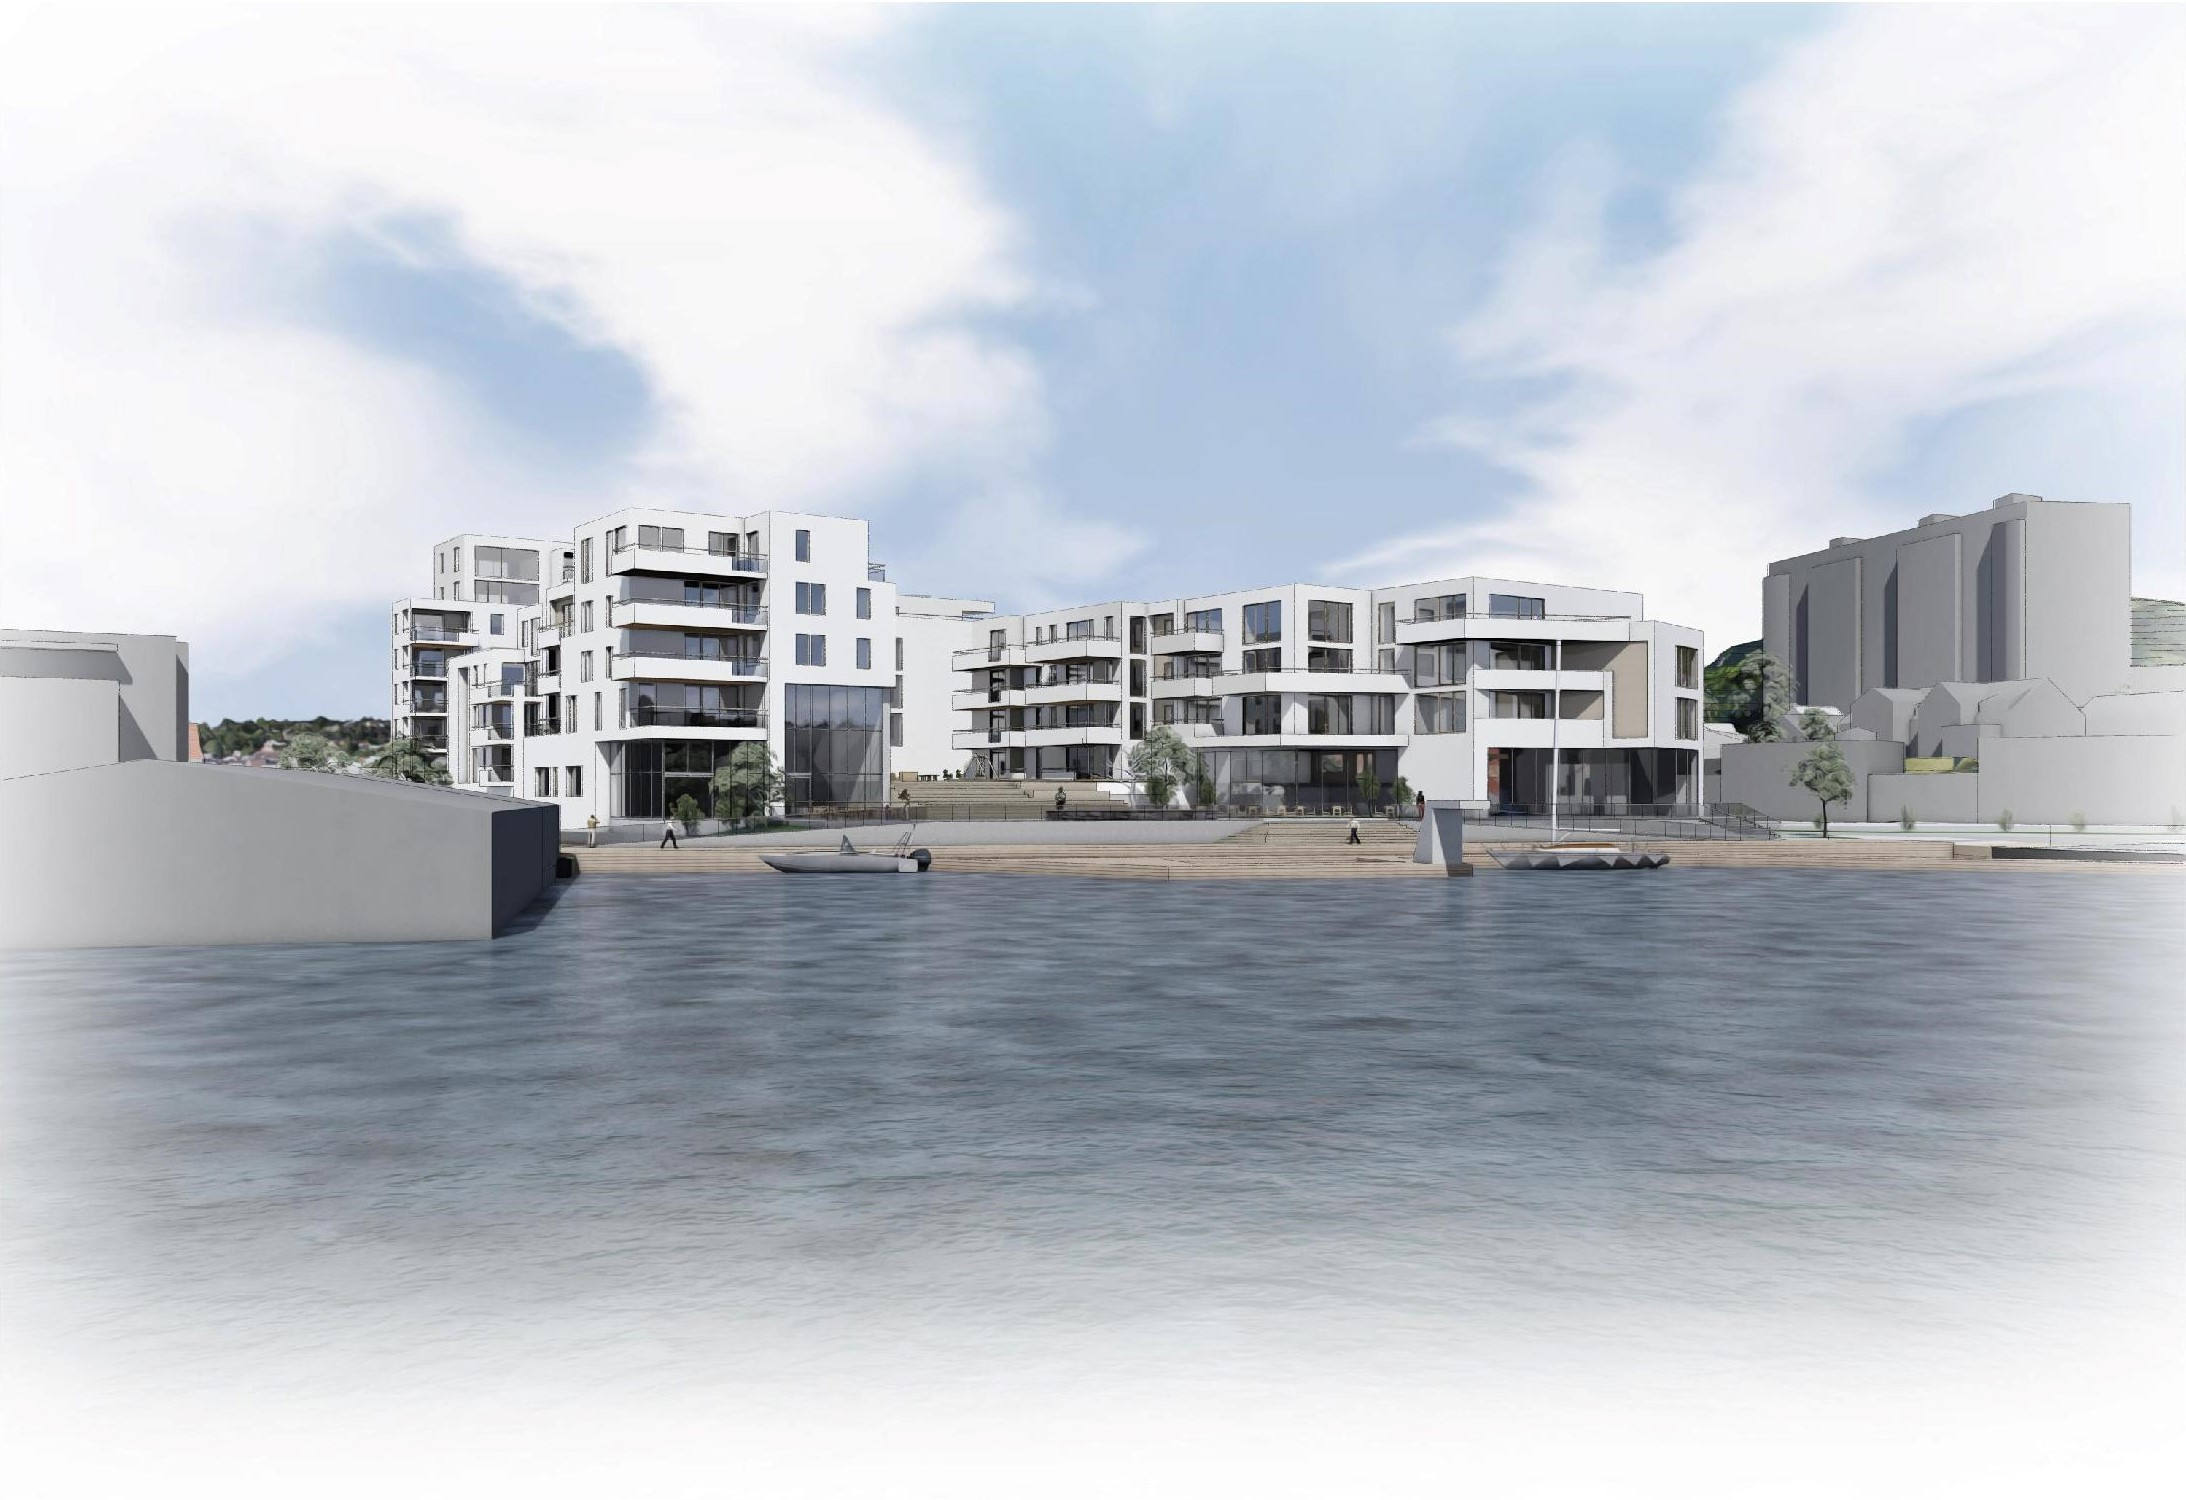 Carlsenkvartalet - boligutvikling